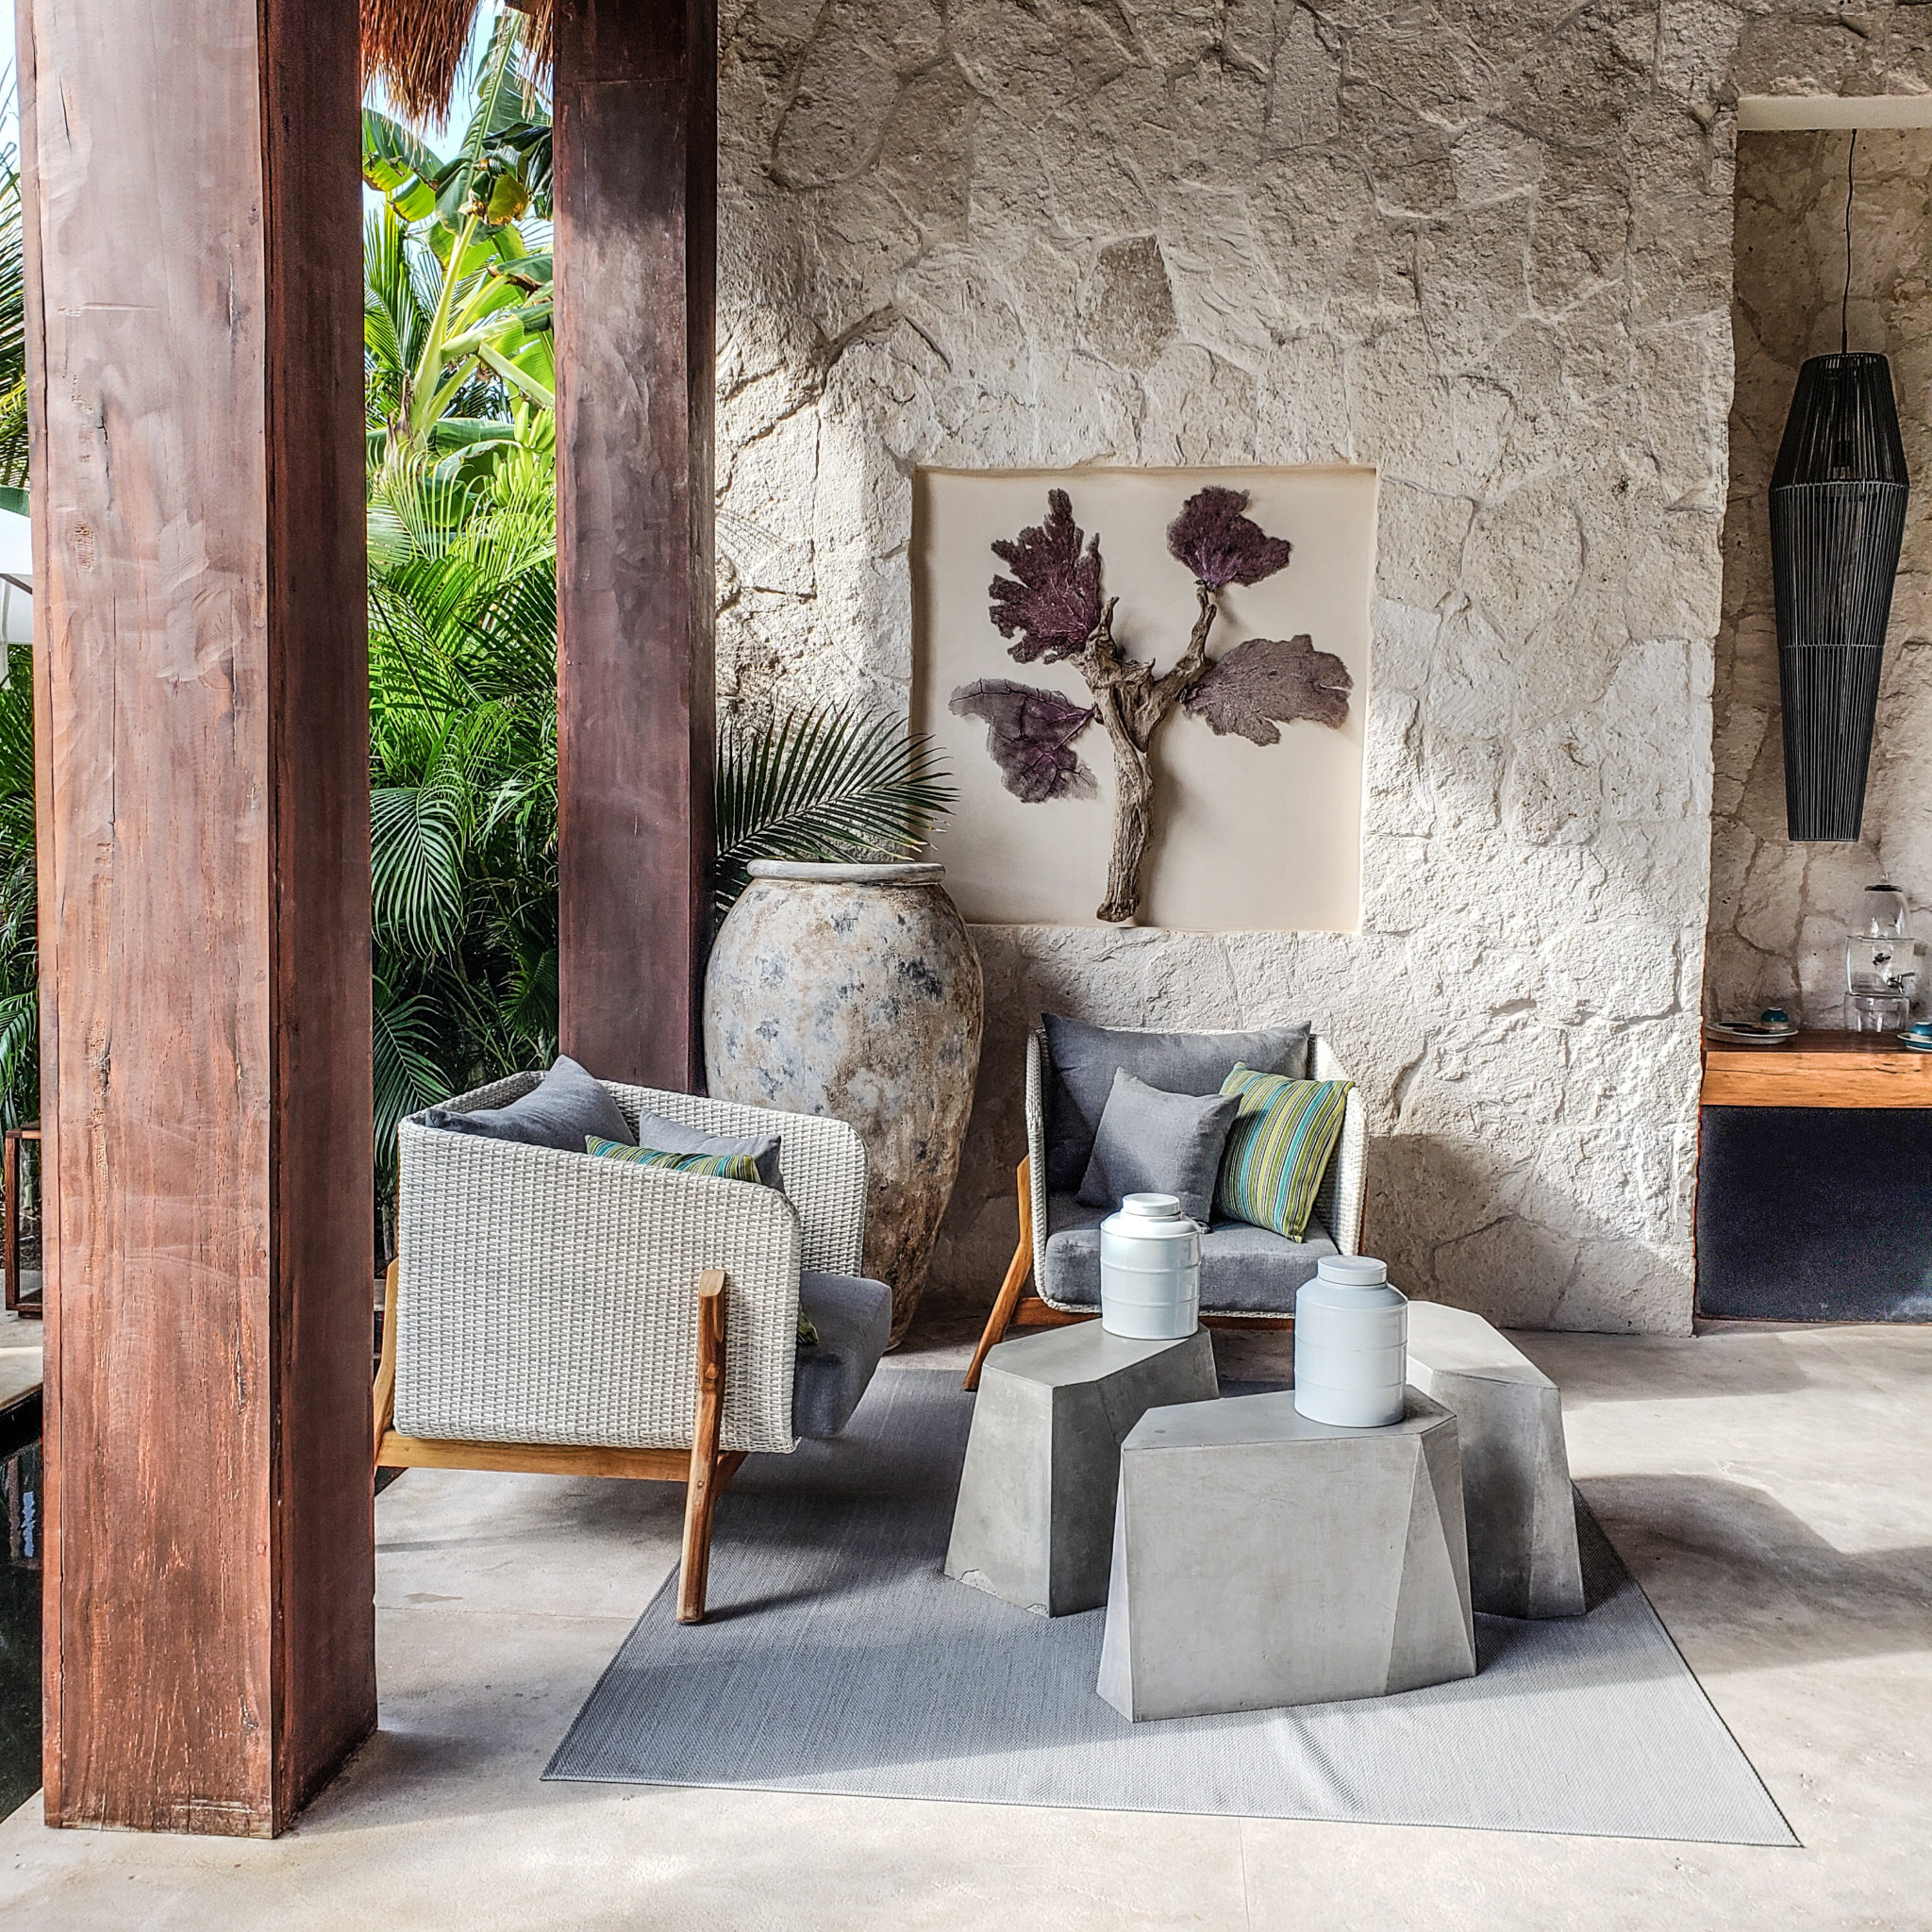 Chable Maroma Resort - Quintana Roo - Playa Del Carmen - Playa Maroma - Spa - Lounge